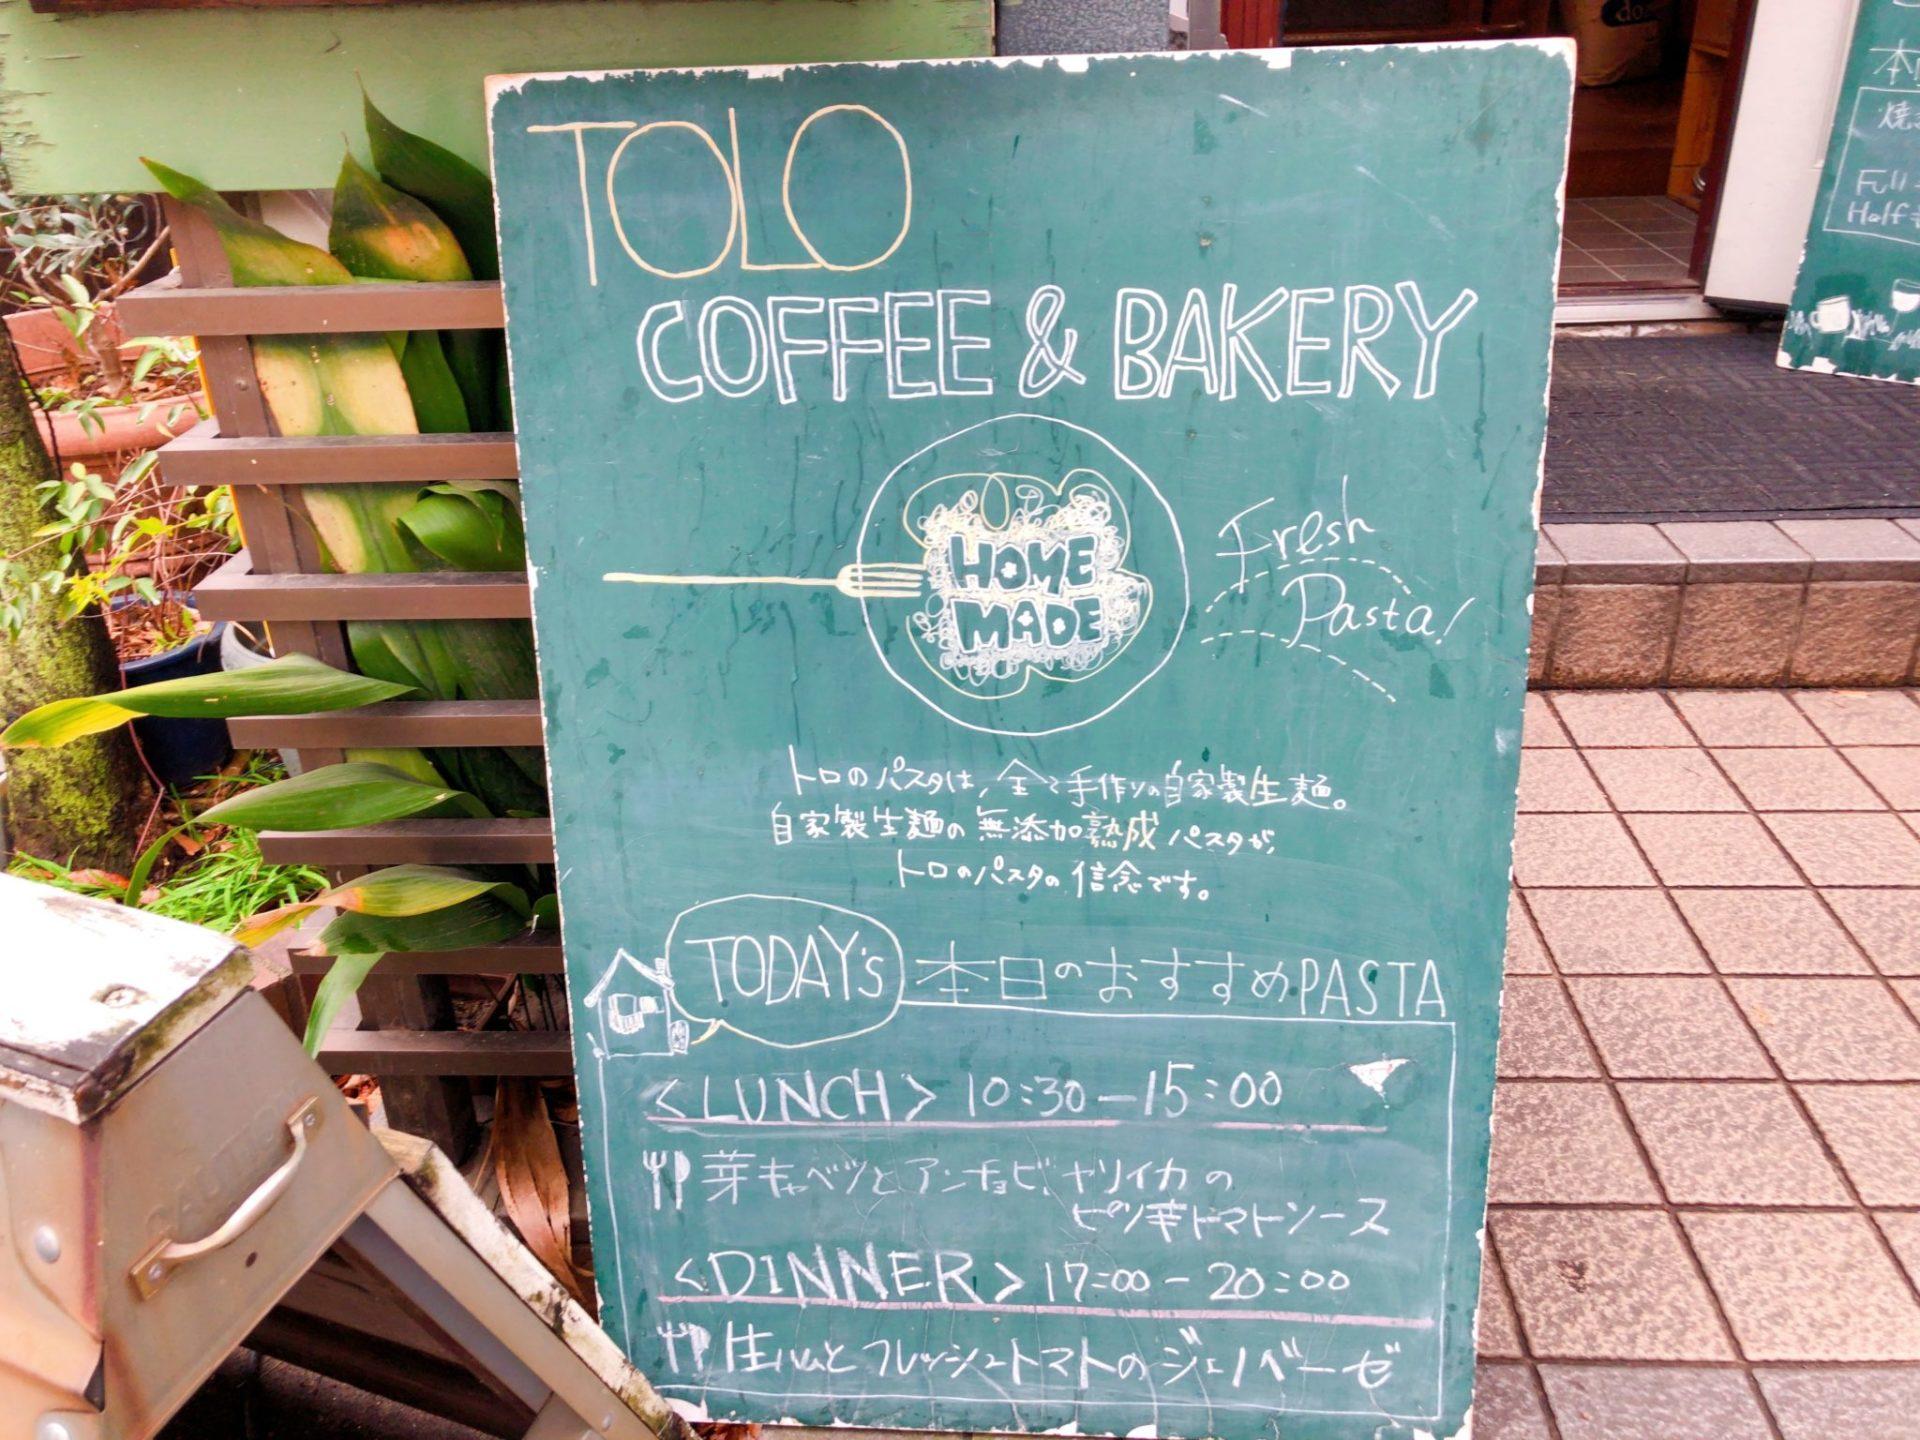 TOLO COFFEE&BAKERYのメニュー